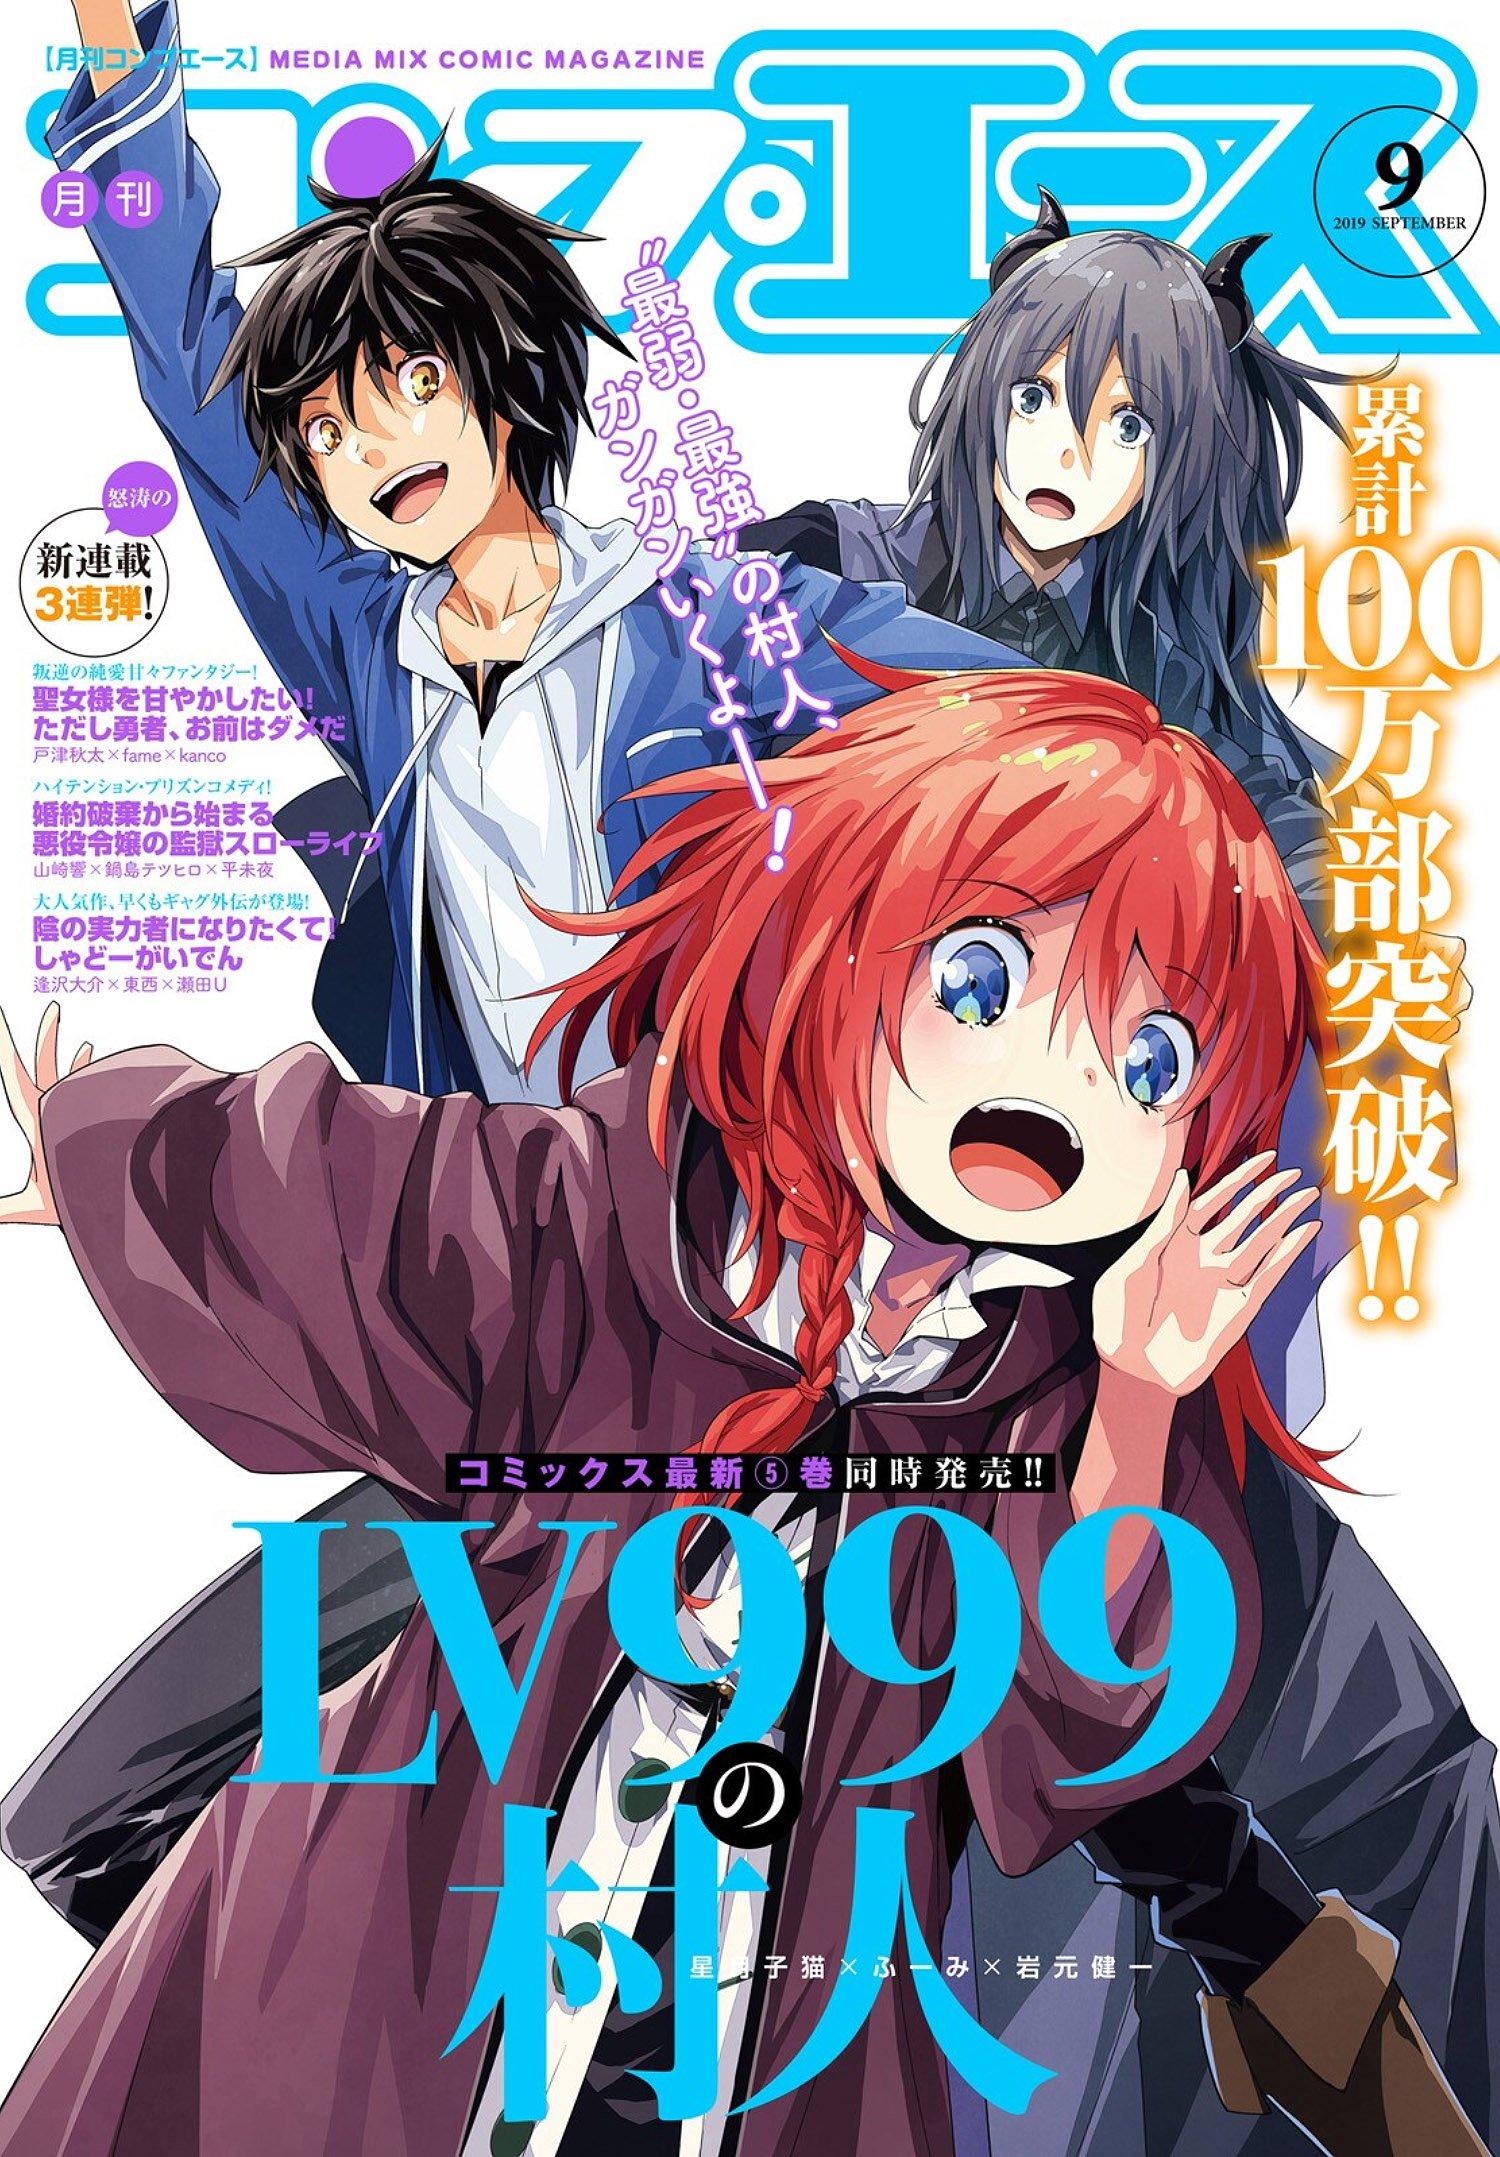 Comp Ace Issue 164 (September 2019) (digital)